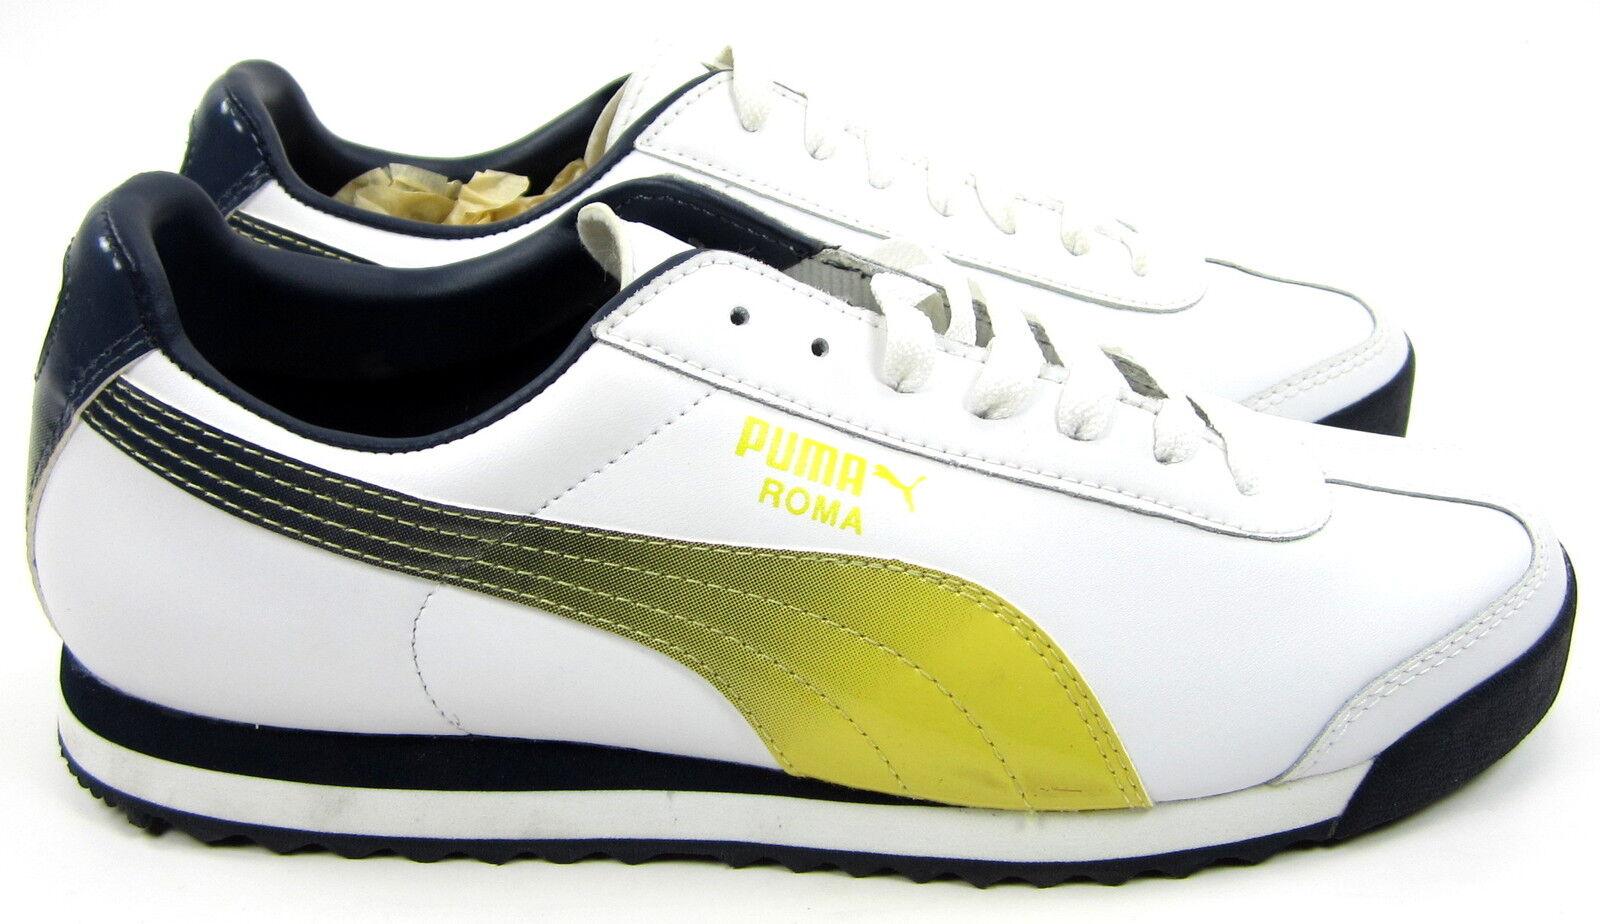 d2acf5b11 ... Zapatos Puma Roma deportivo blanco / amarillo / / / negro zapatillas  comodas gradiente modelo mas ...